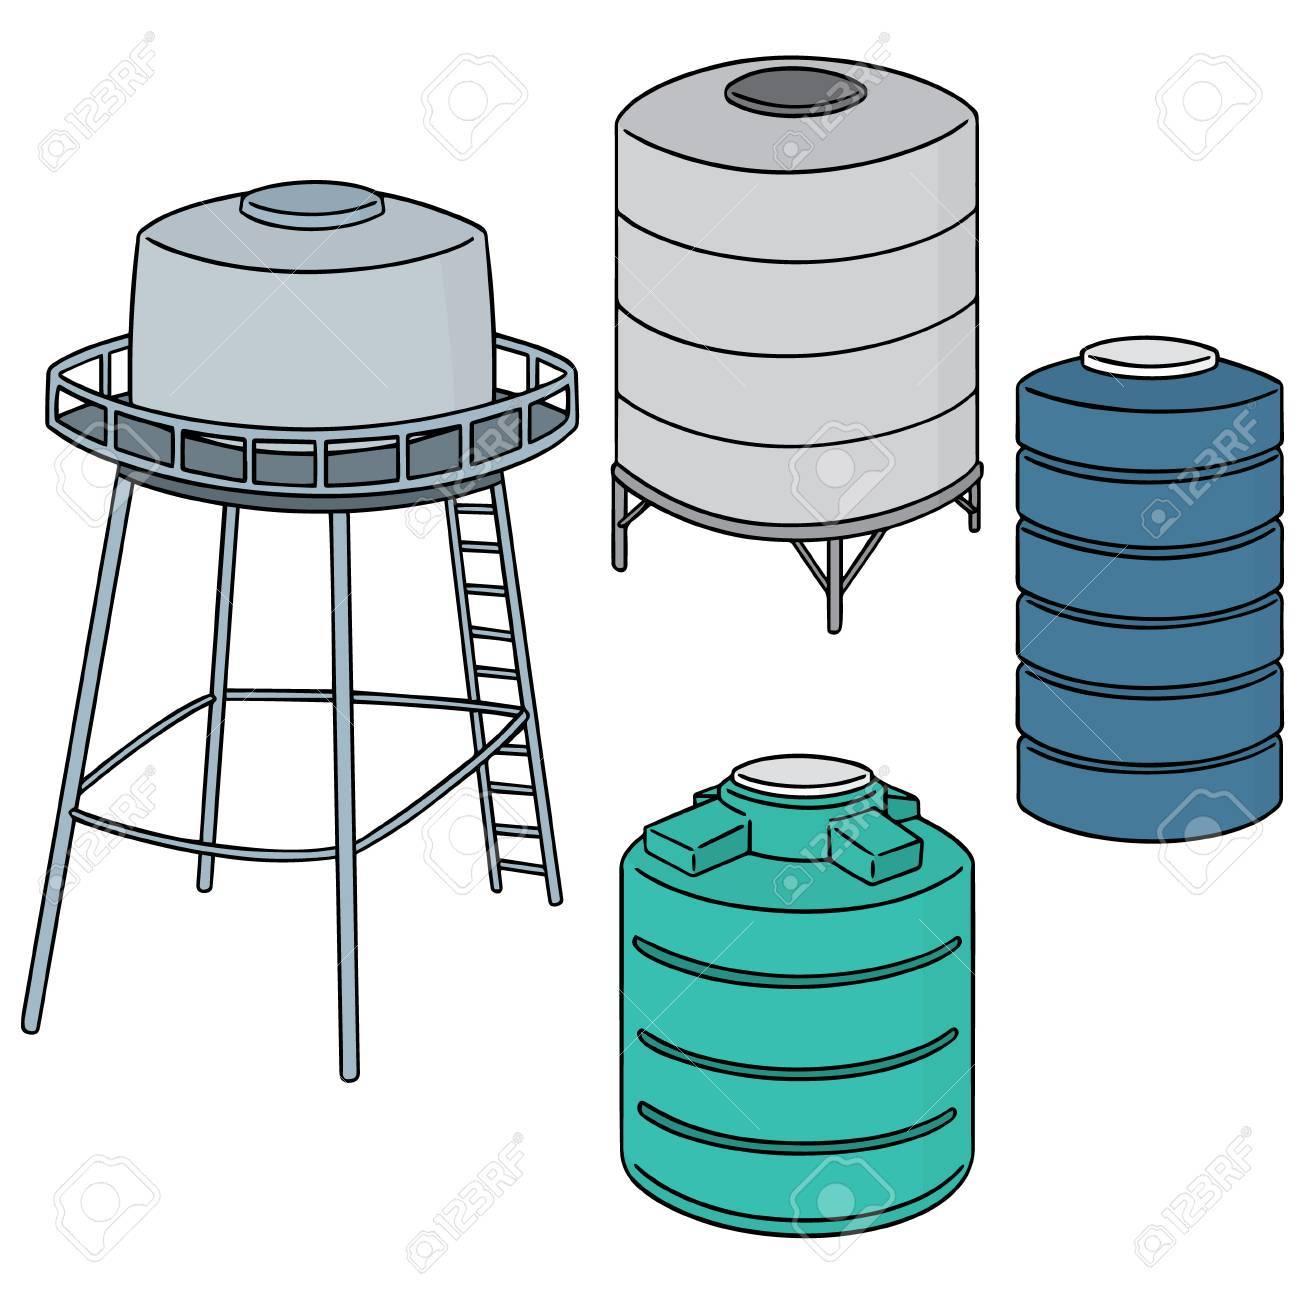 Storage tank clipart 1 » Clipart Portal.